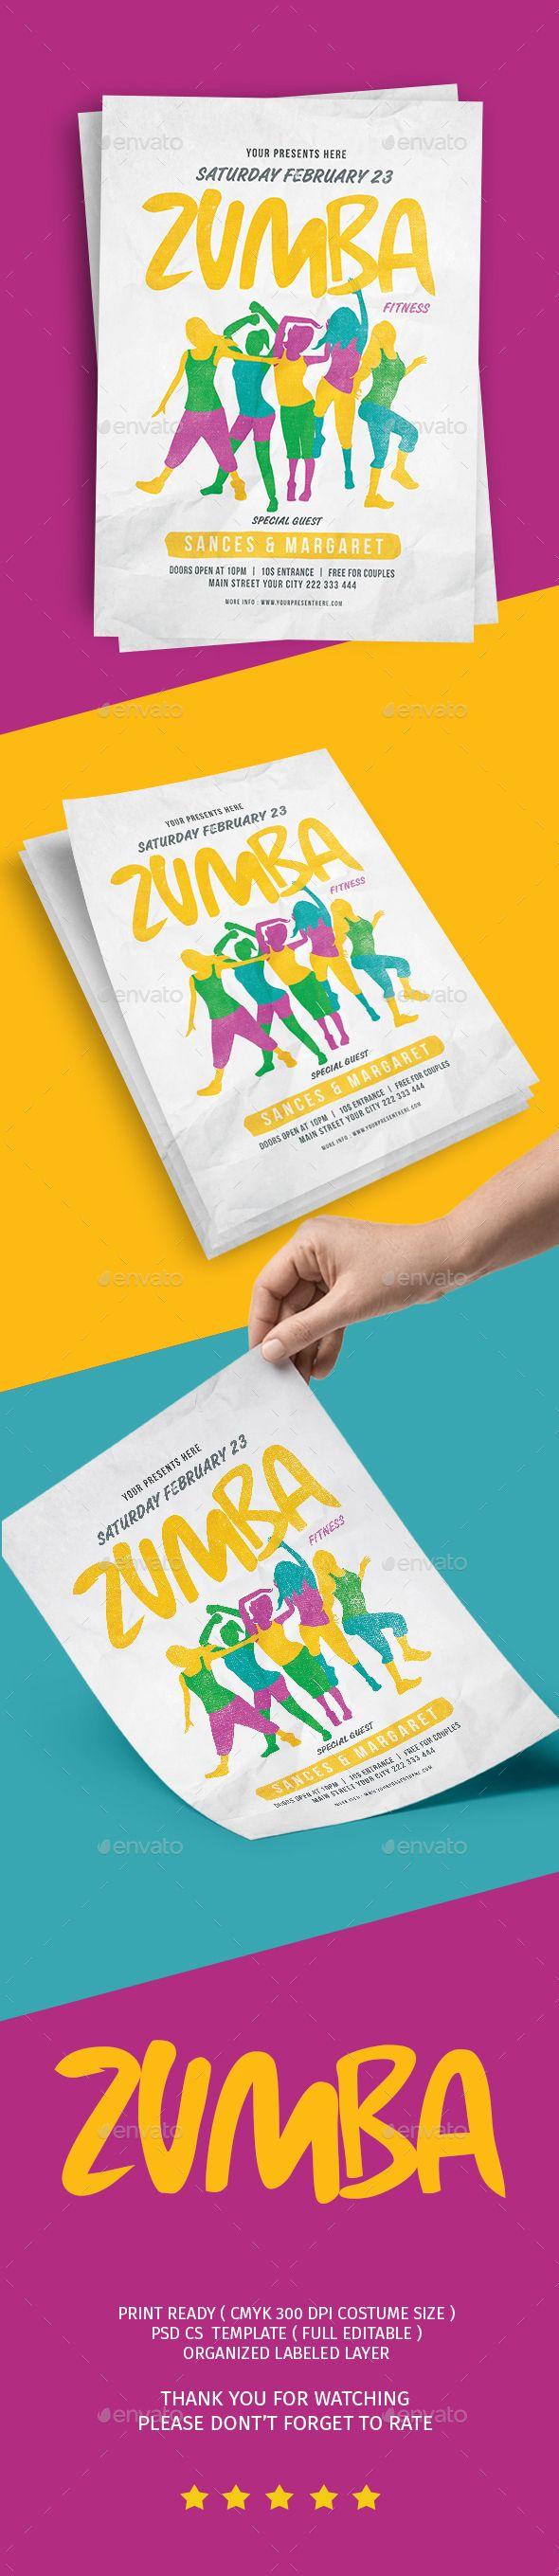 Free Printable Zumba Fundraiser Flyer Templates Altin